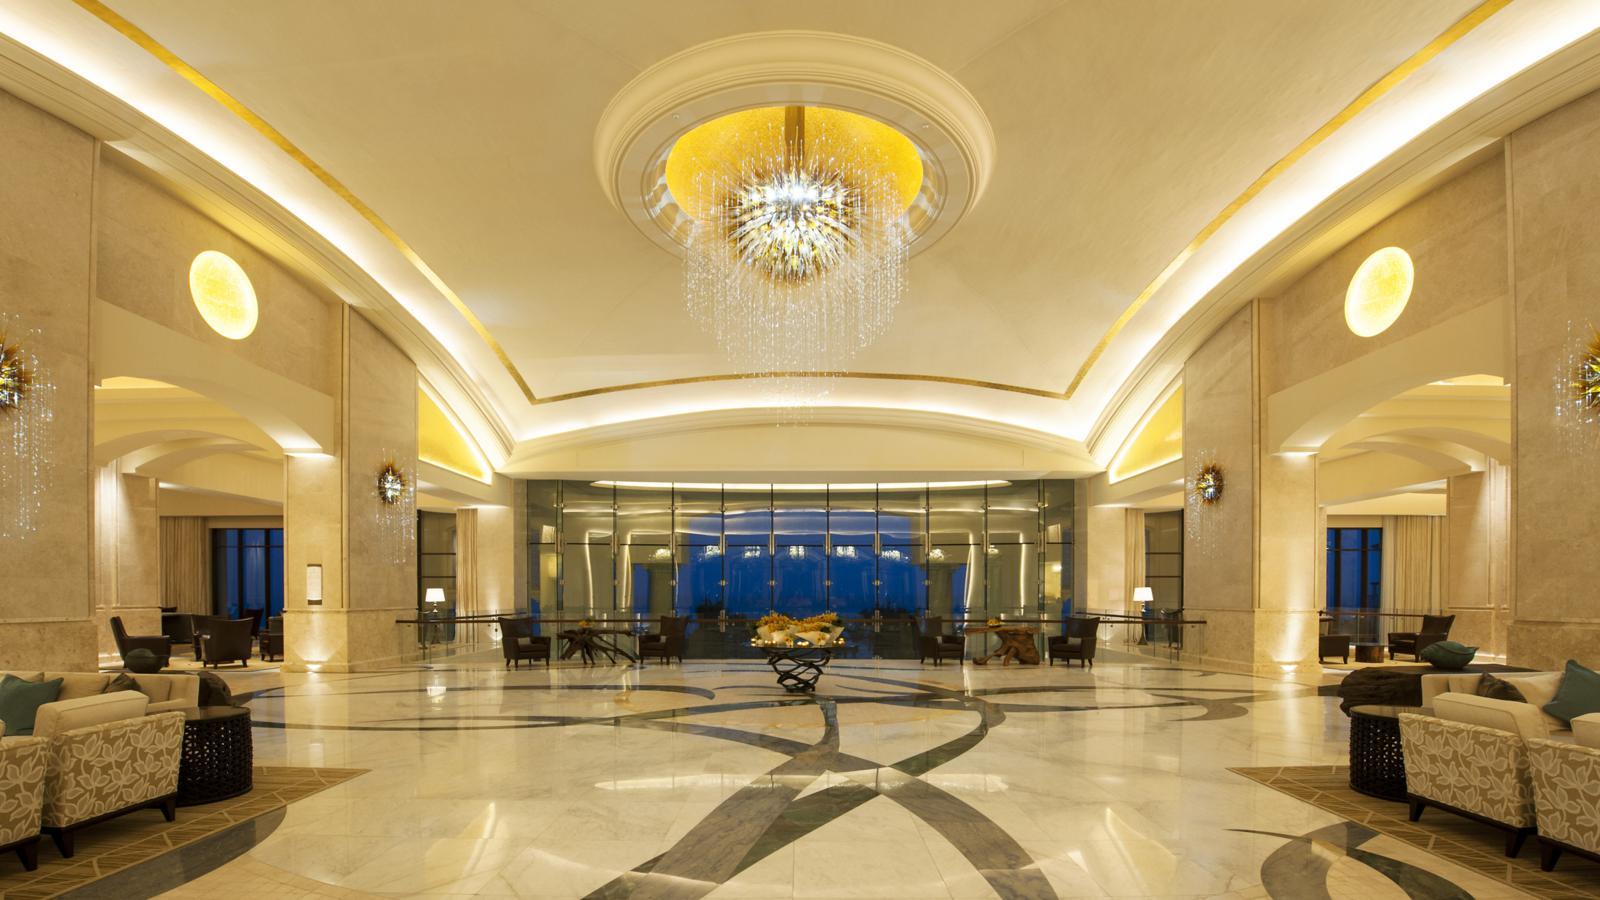 Crystal palace casino 12